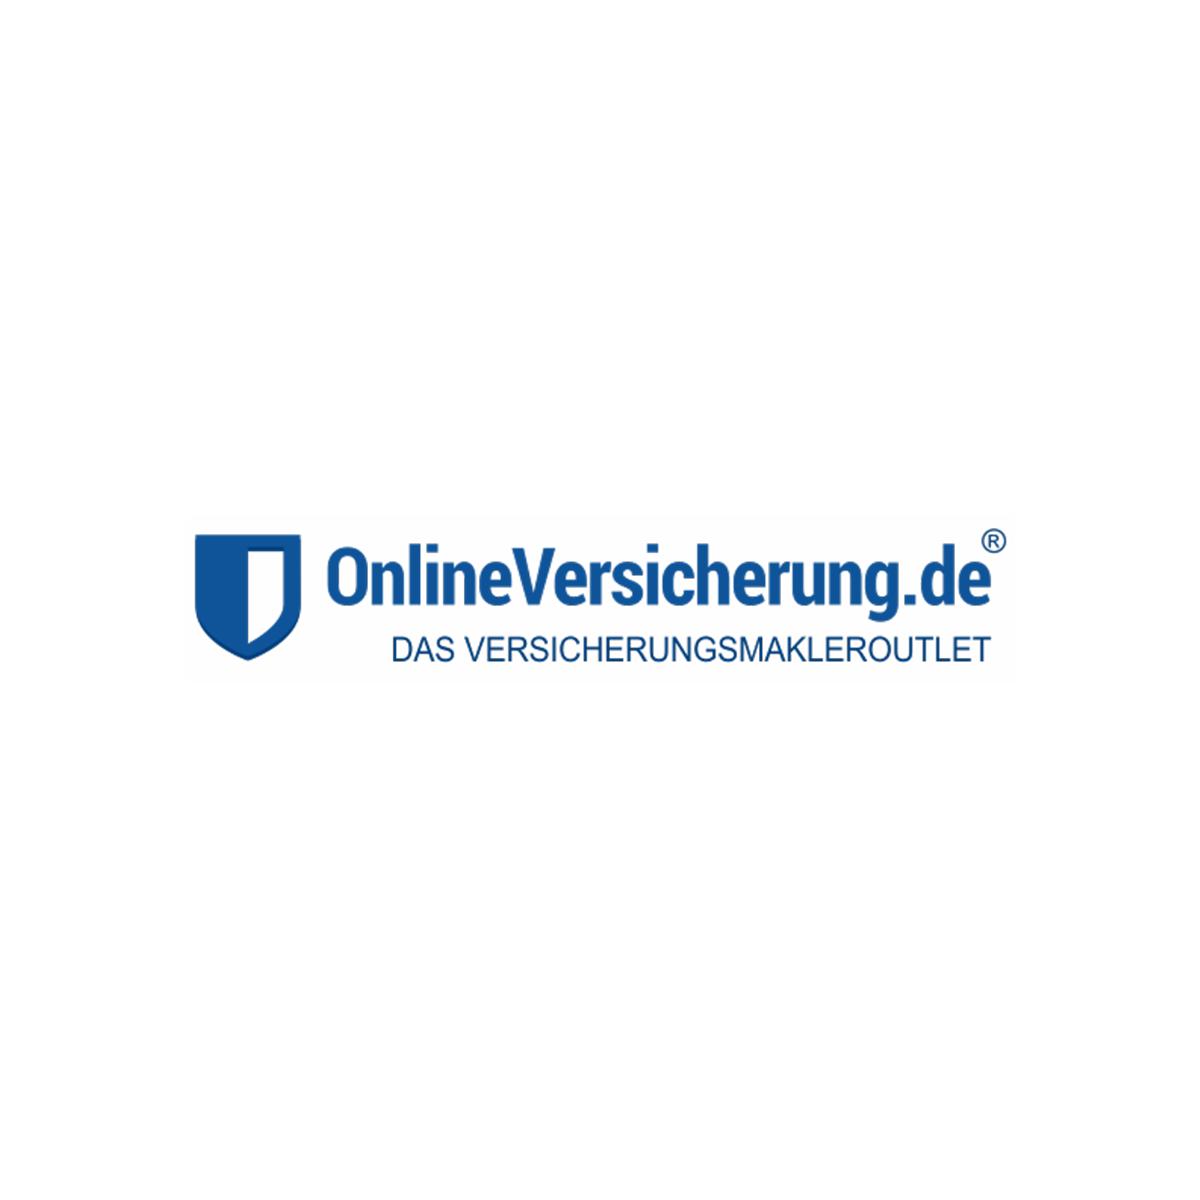 Onlineversicherung